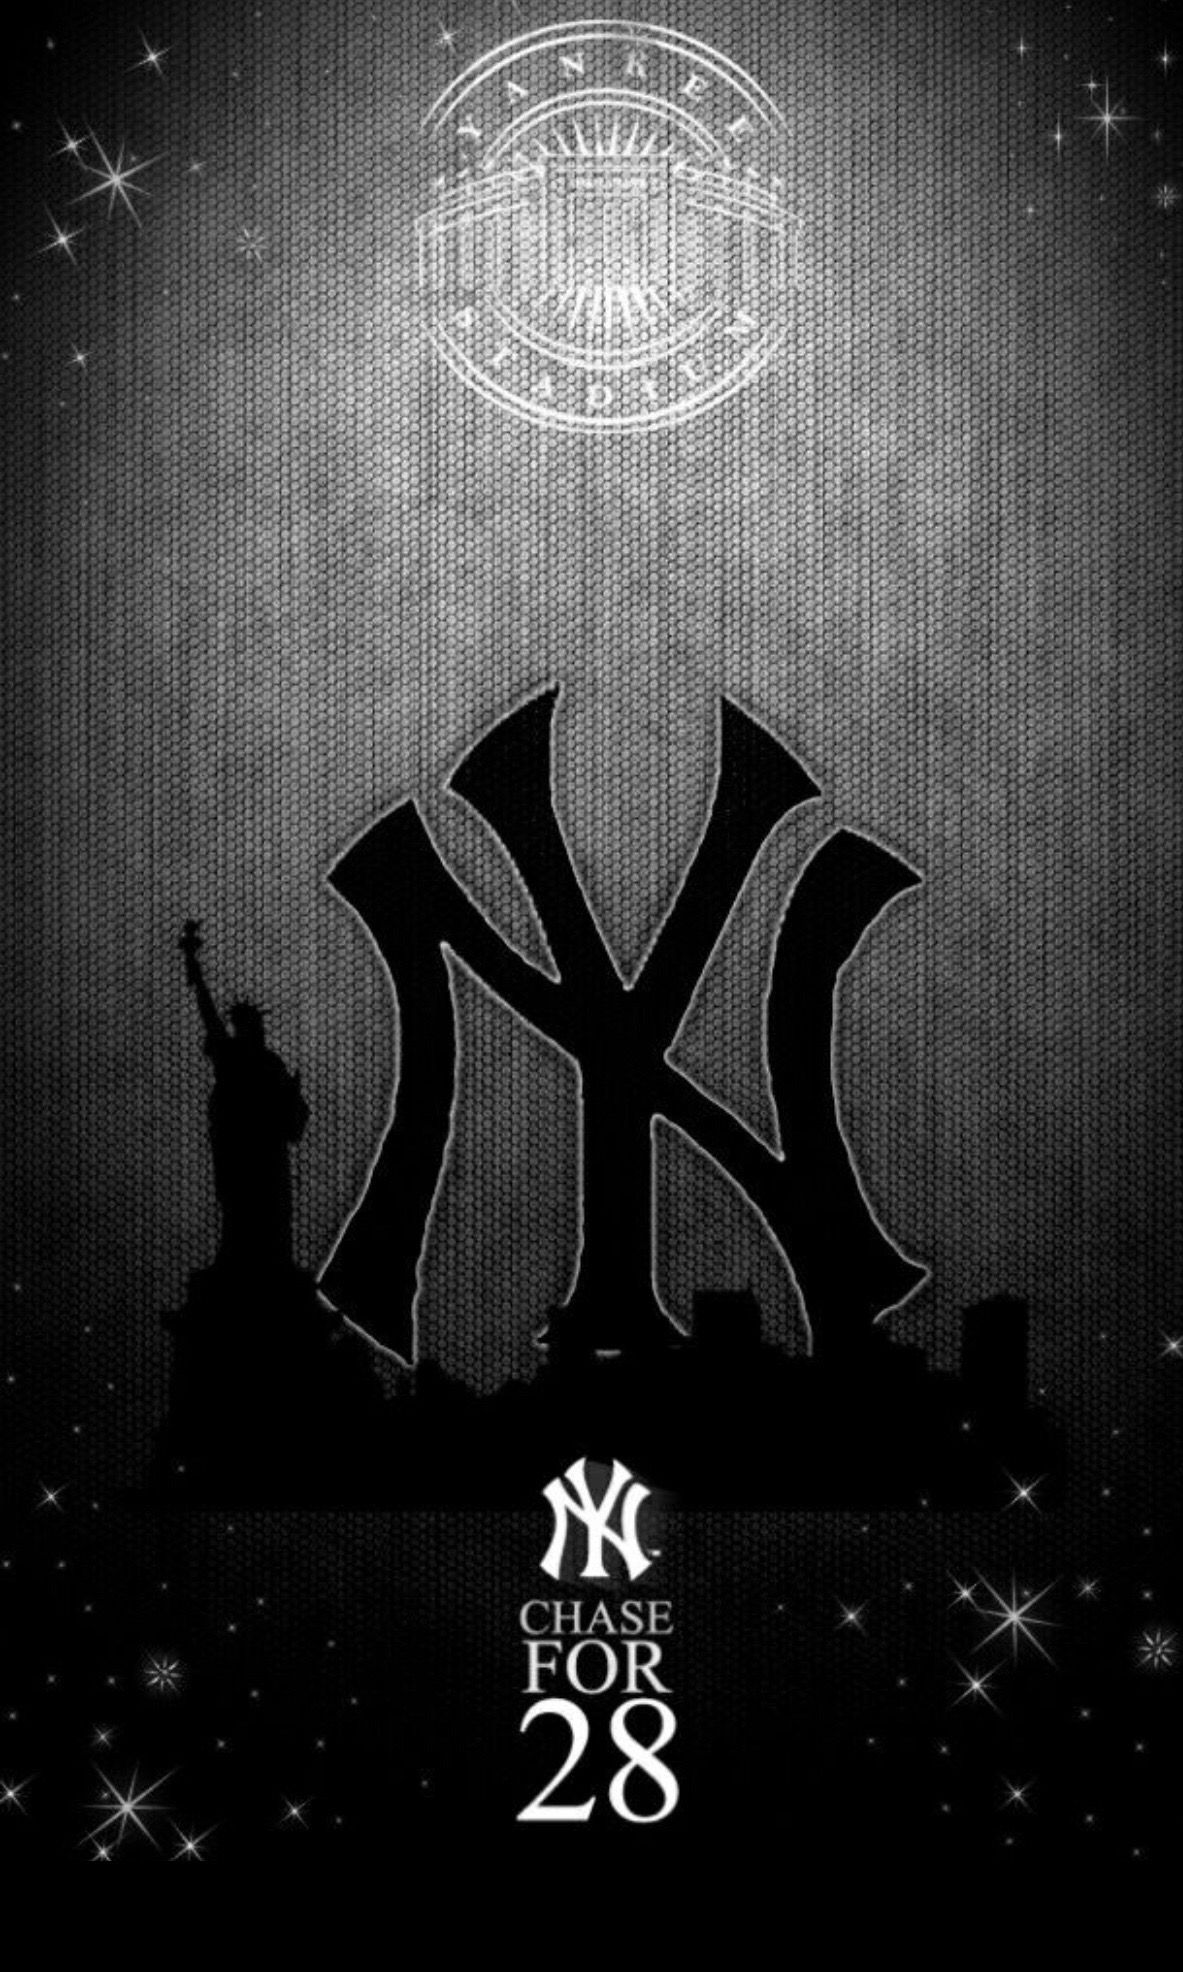 Pin By Steve Izzo On Yankees Logo Yankees Baseball New York Yankees Baseball New York Yankees